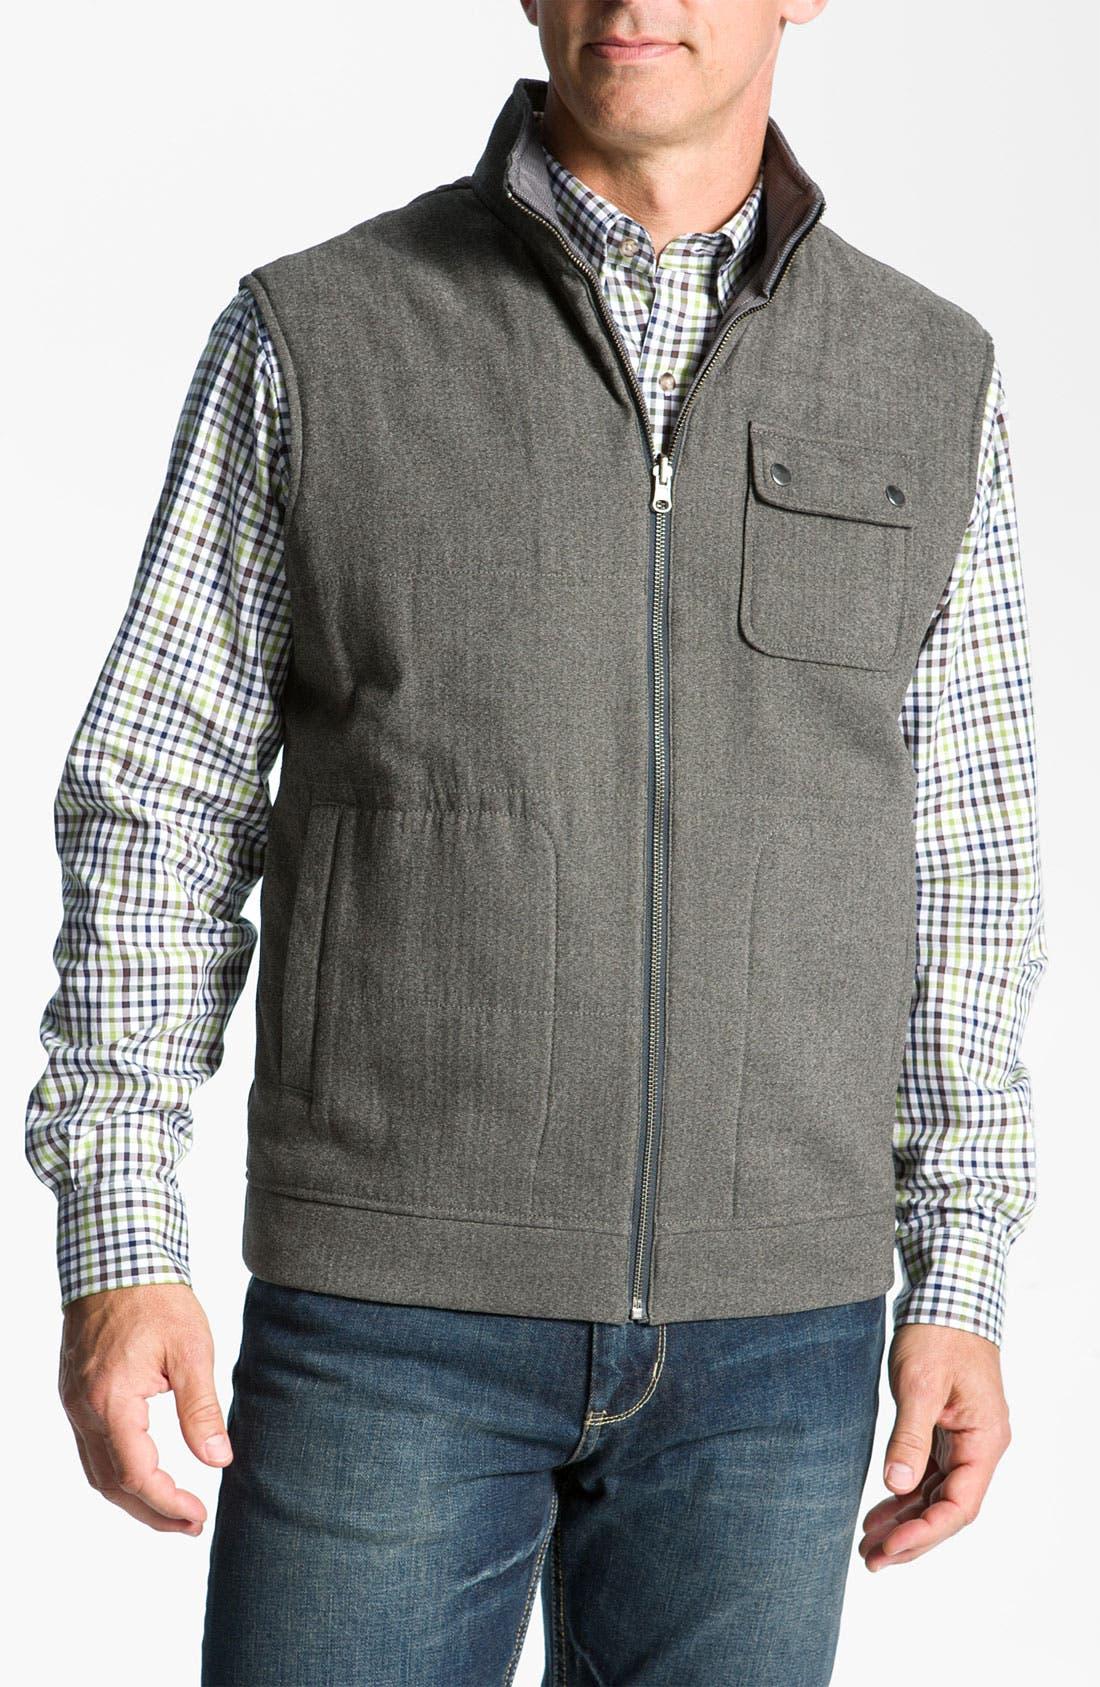 Main Image - Cutter & Buck 'Mount Baker' Reversible Vest (Big & Tall) (Online Only)